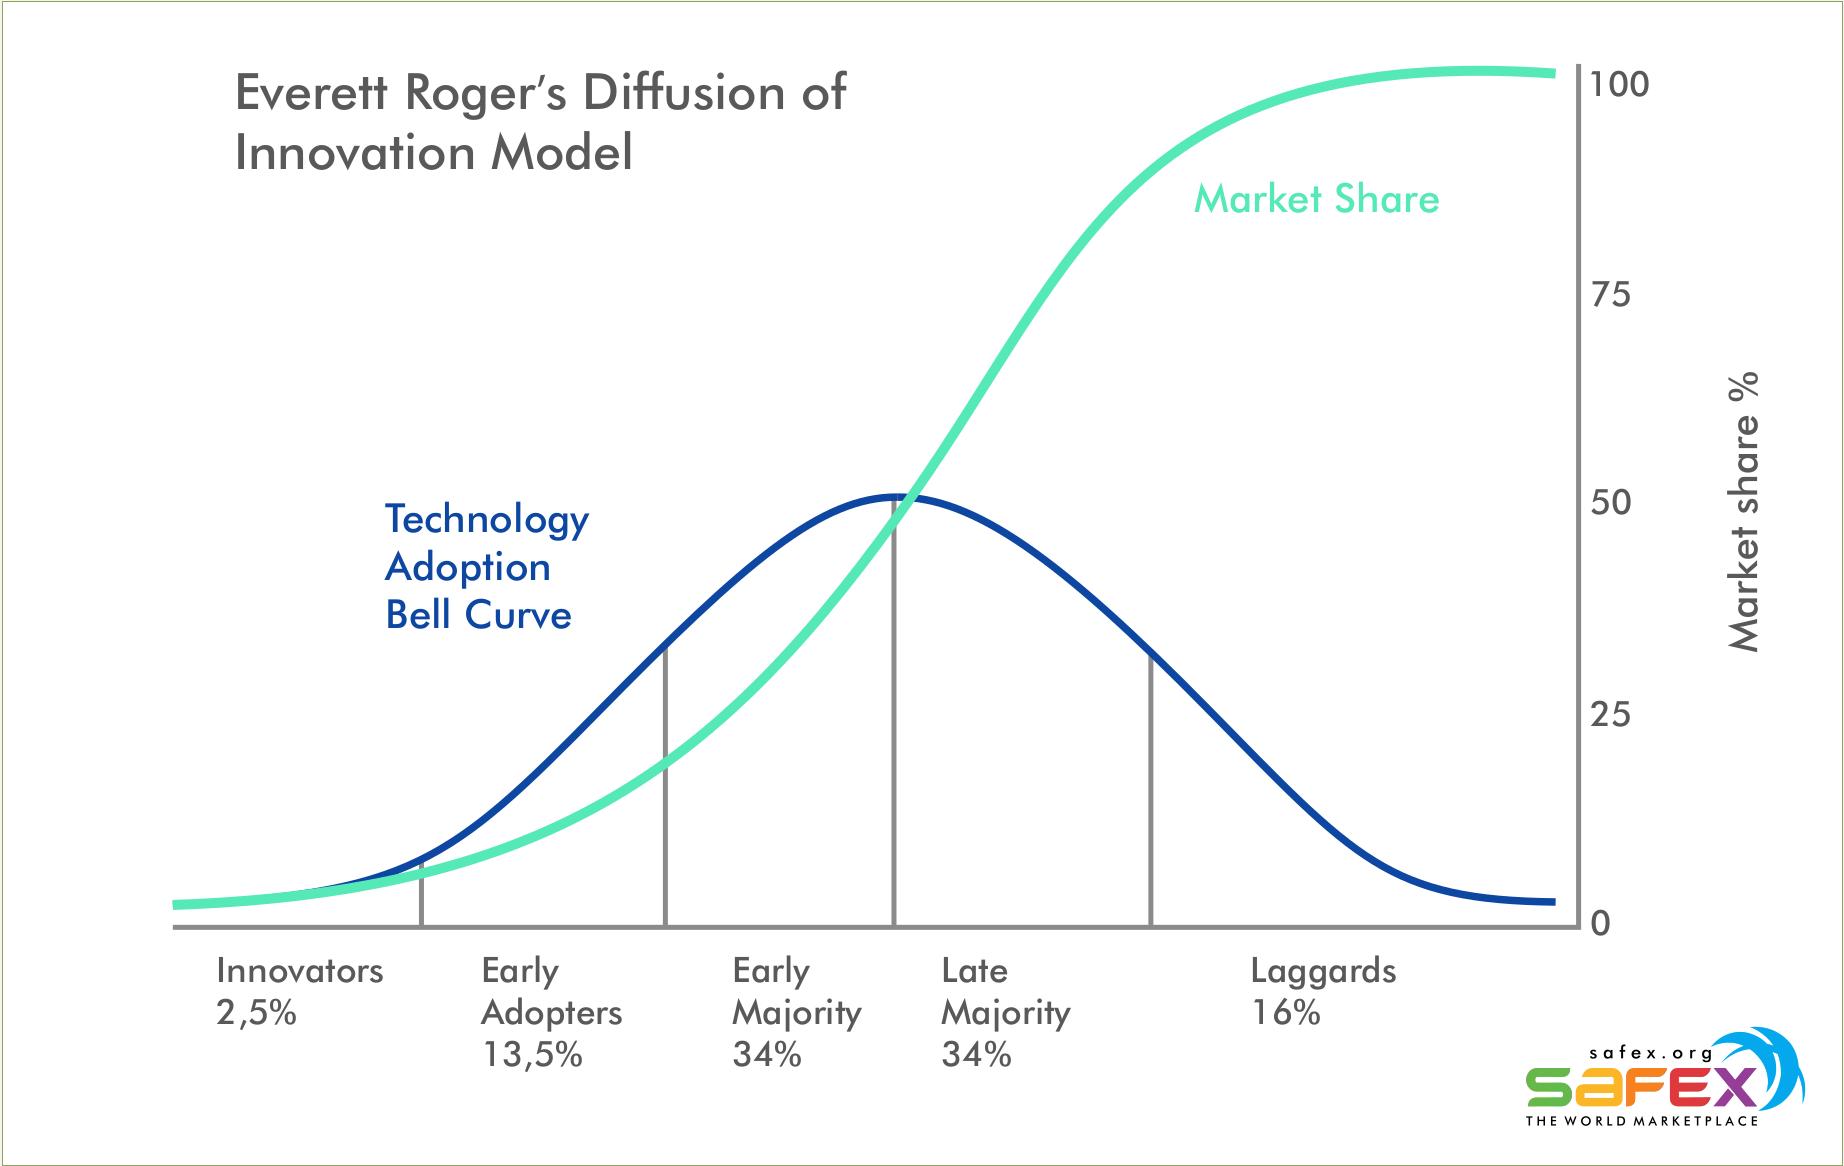 Everett Roger's Diffusion of Innovation Model technology adoption curve (internet, safex blockchain)